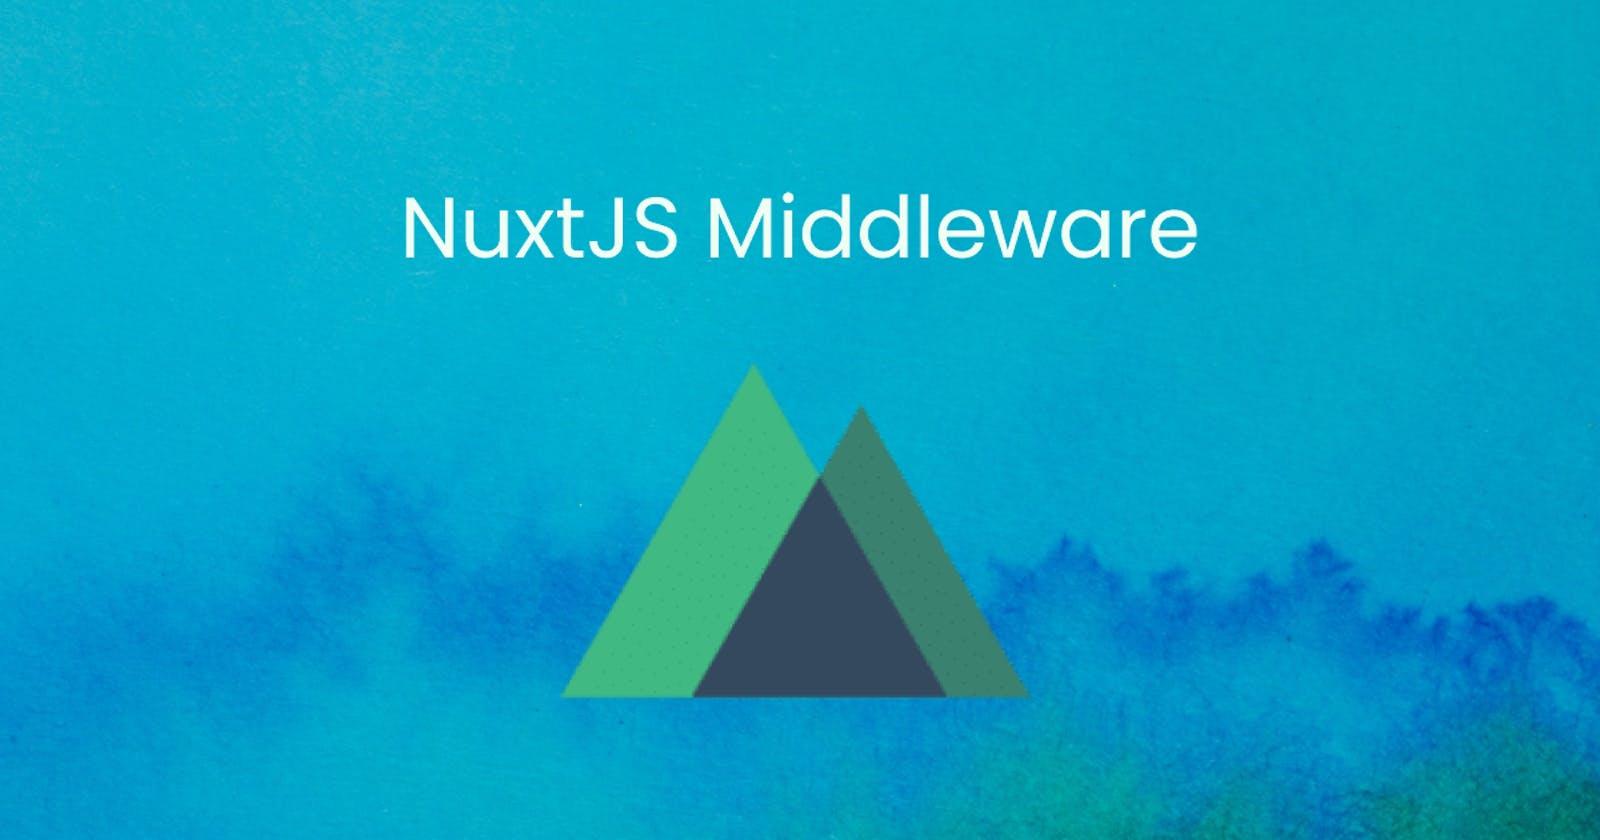 NuxtJS Middleware